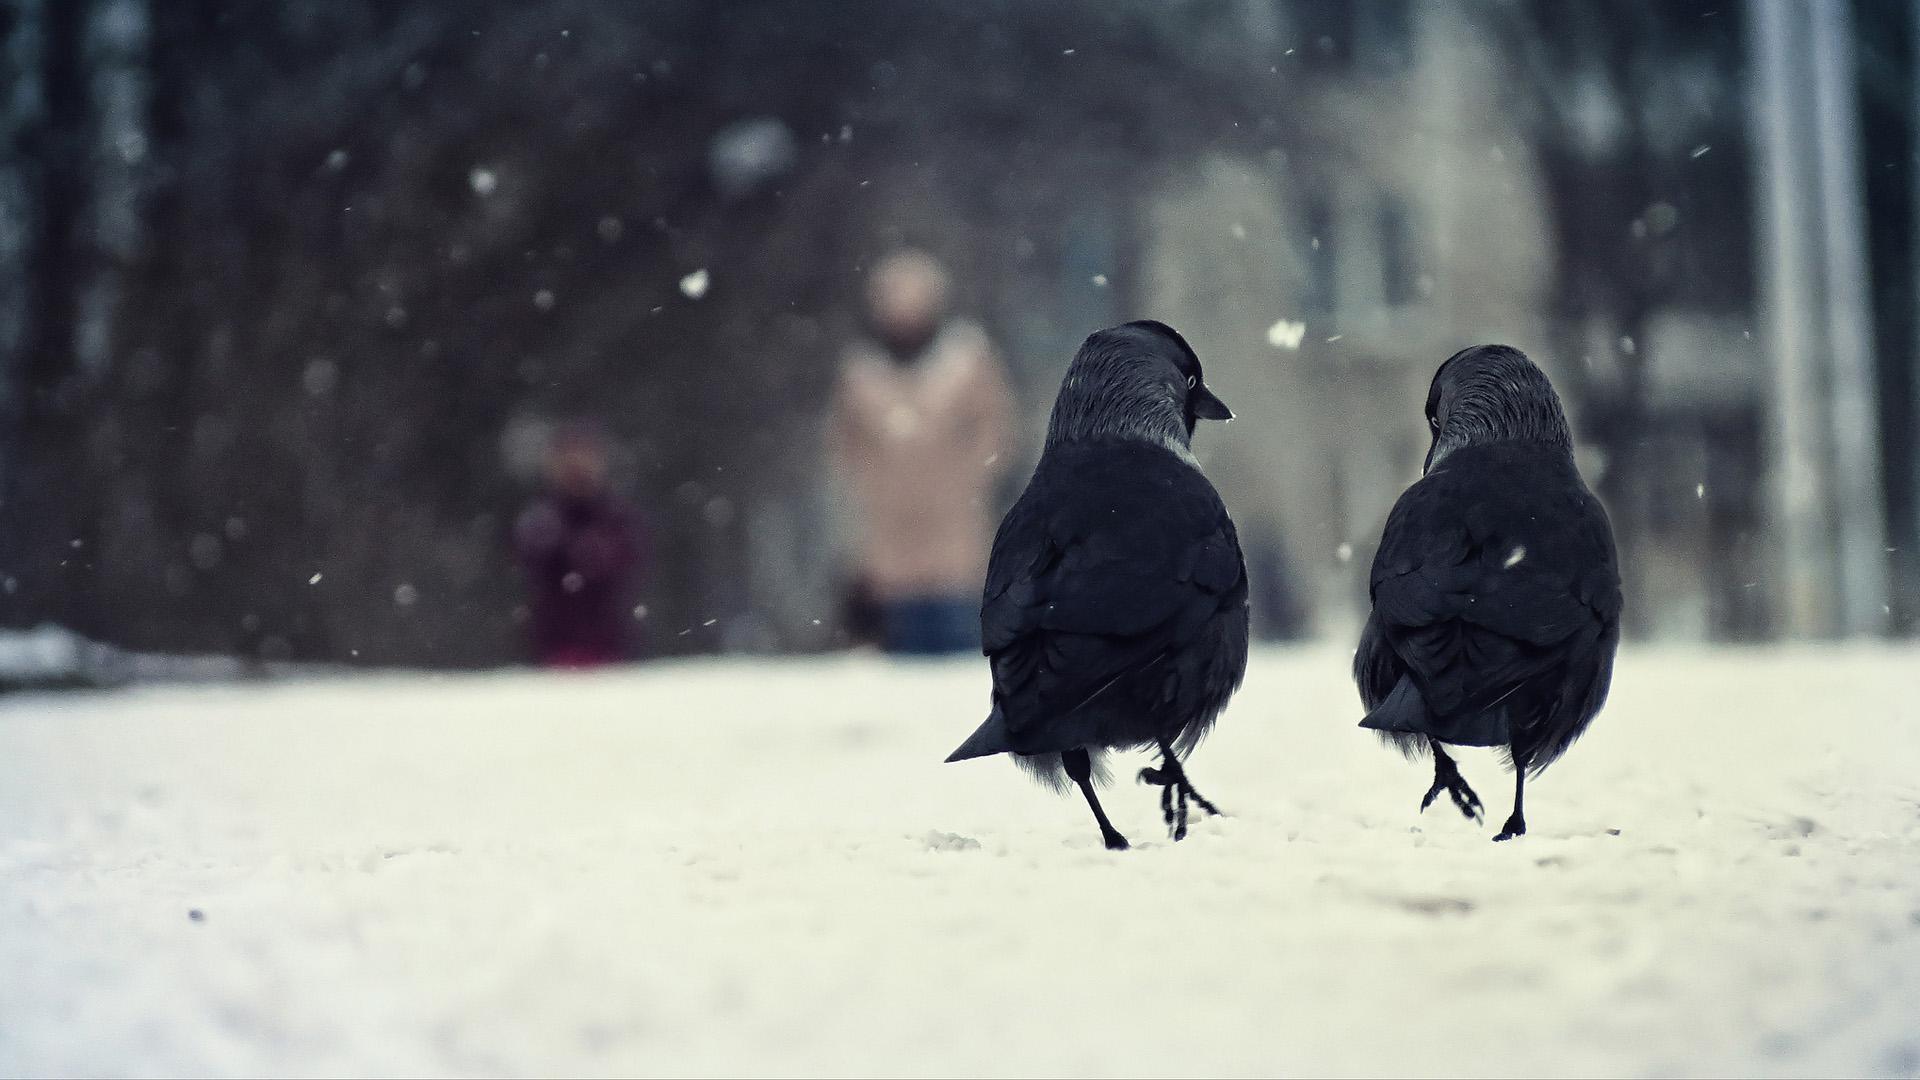 Birds, two, winter, snow, walking, talking, animal wallpaper thumb